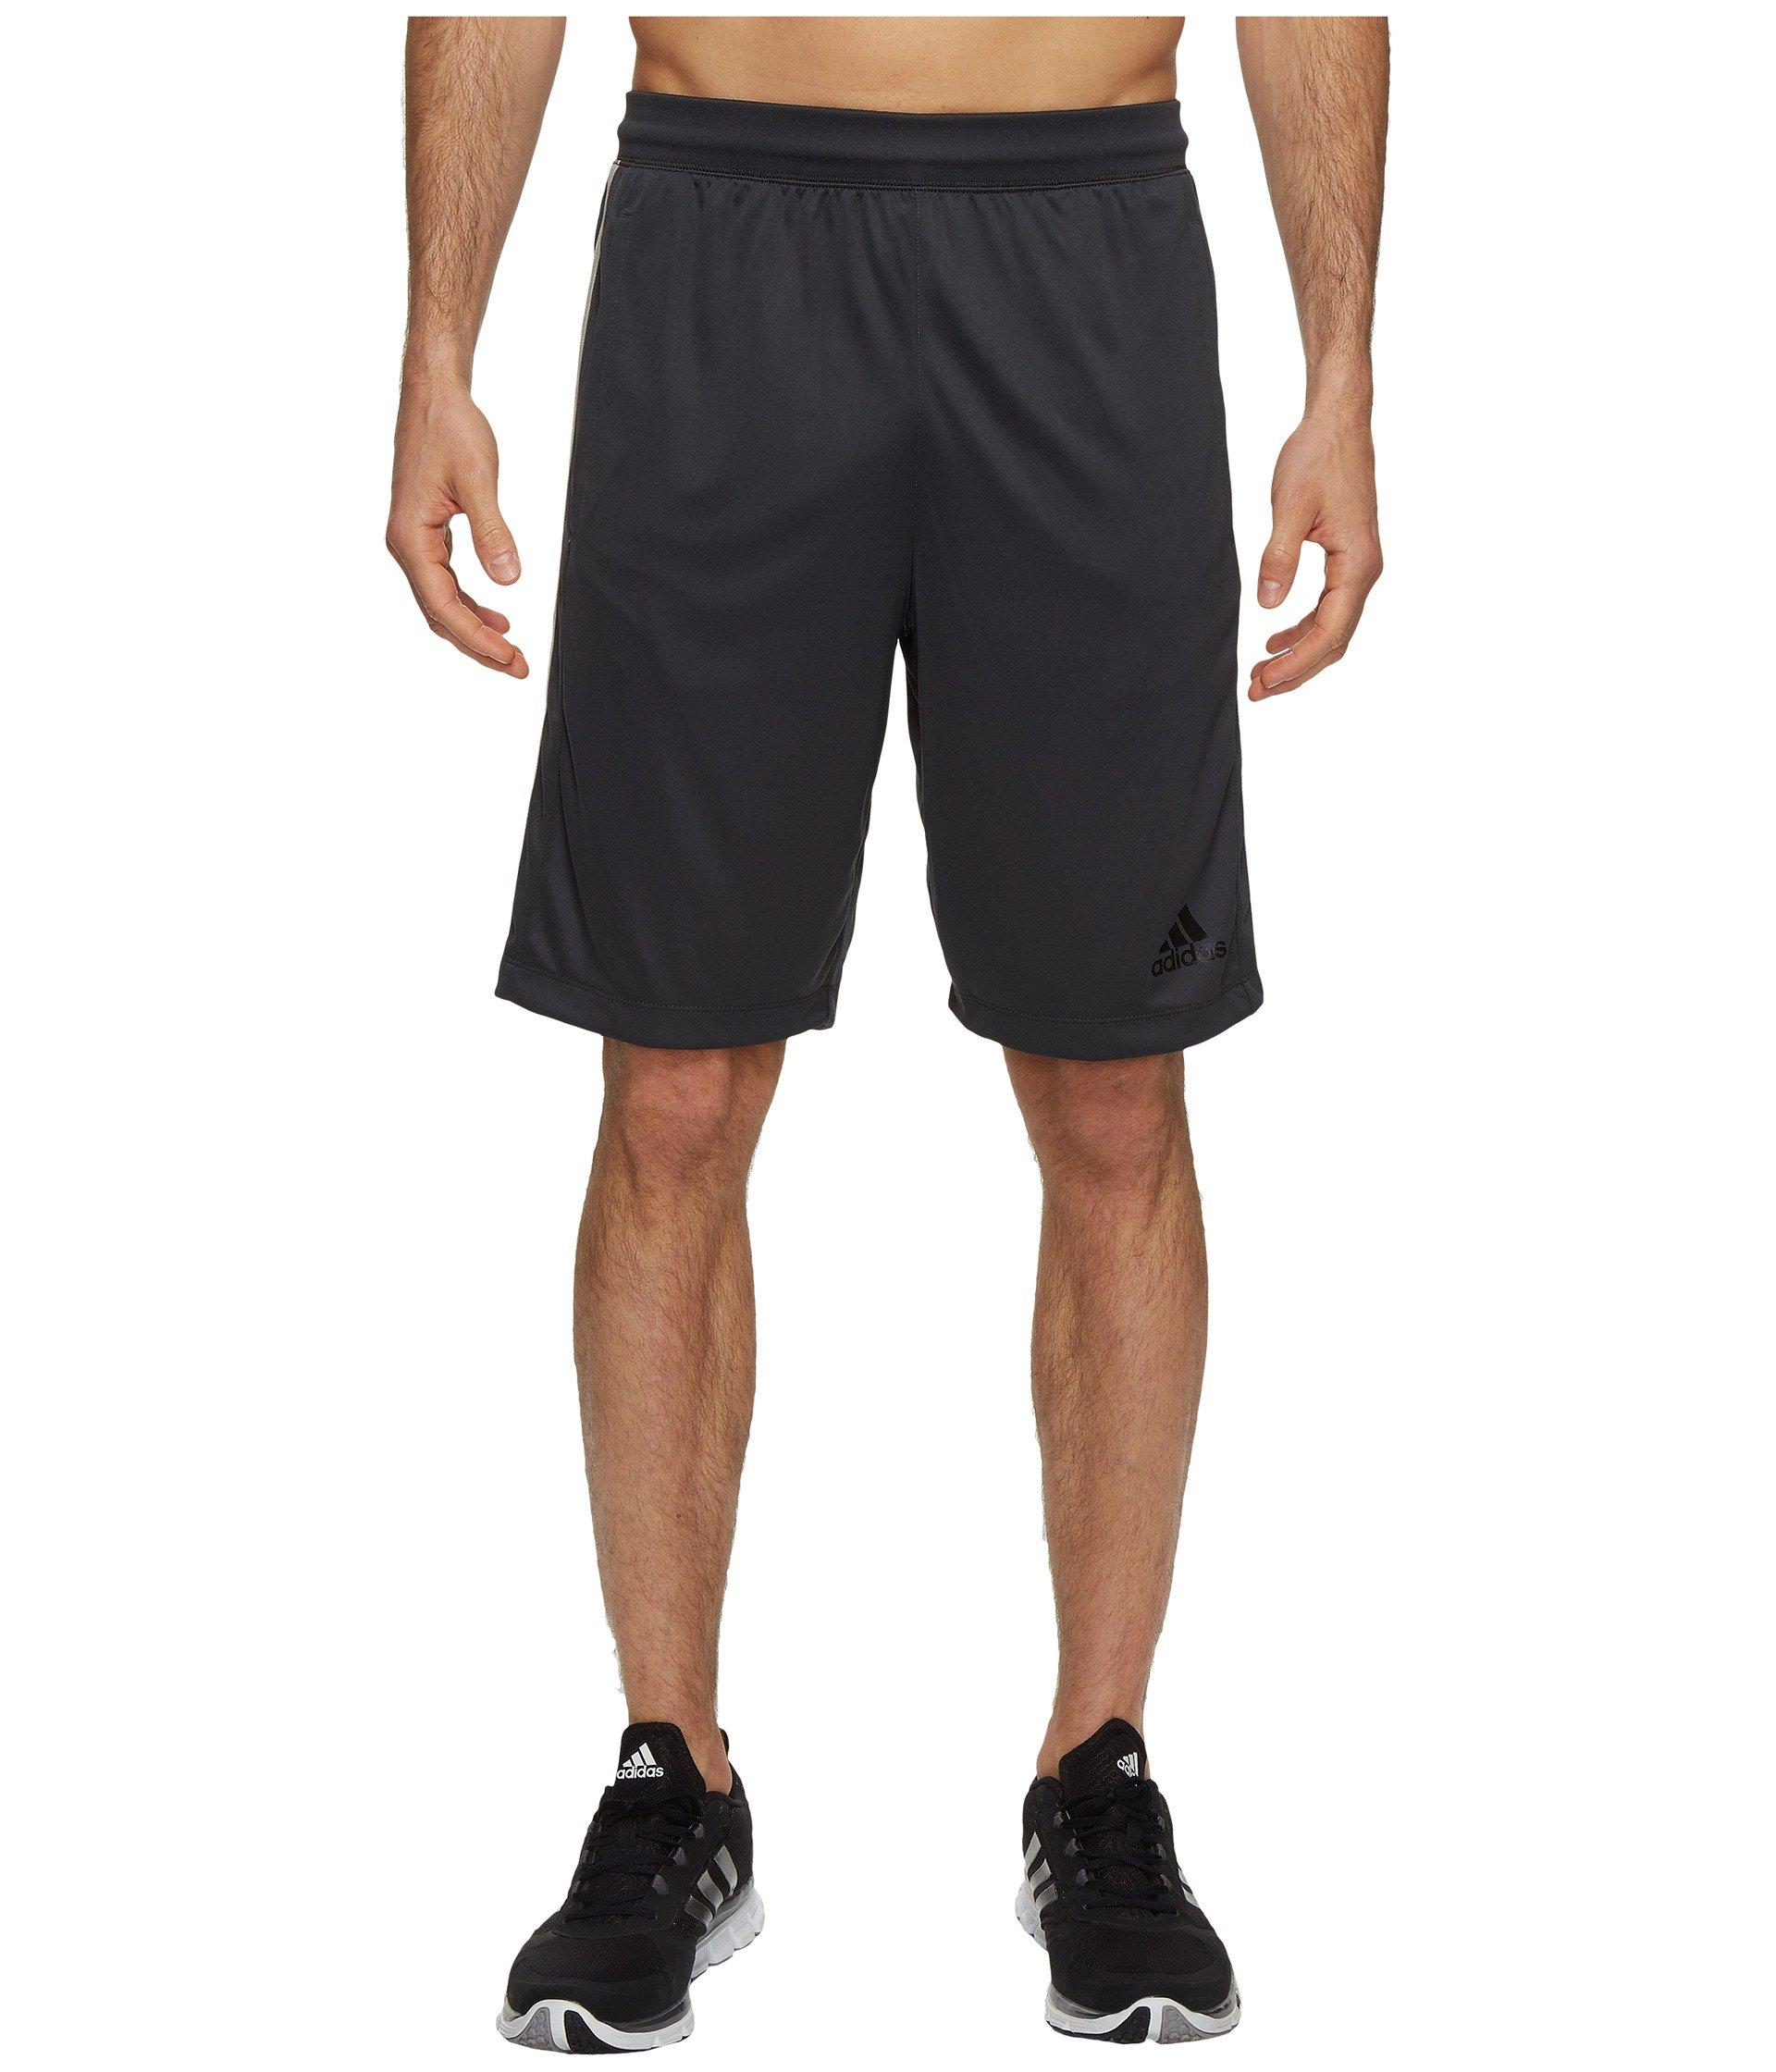 Solid medium Heather Adidas Grey Shorts Grey Dark stripes Designed 2 3 move PqBw1F